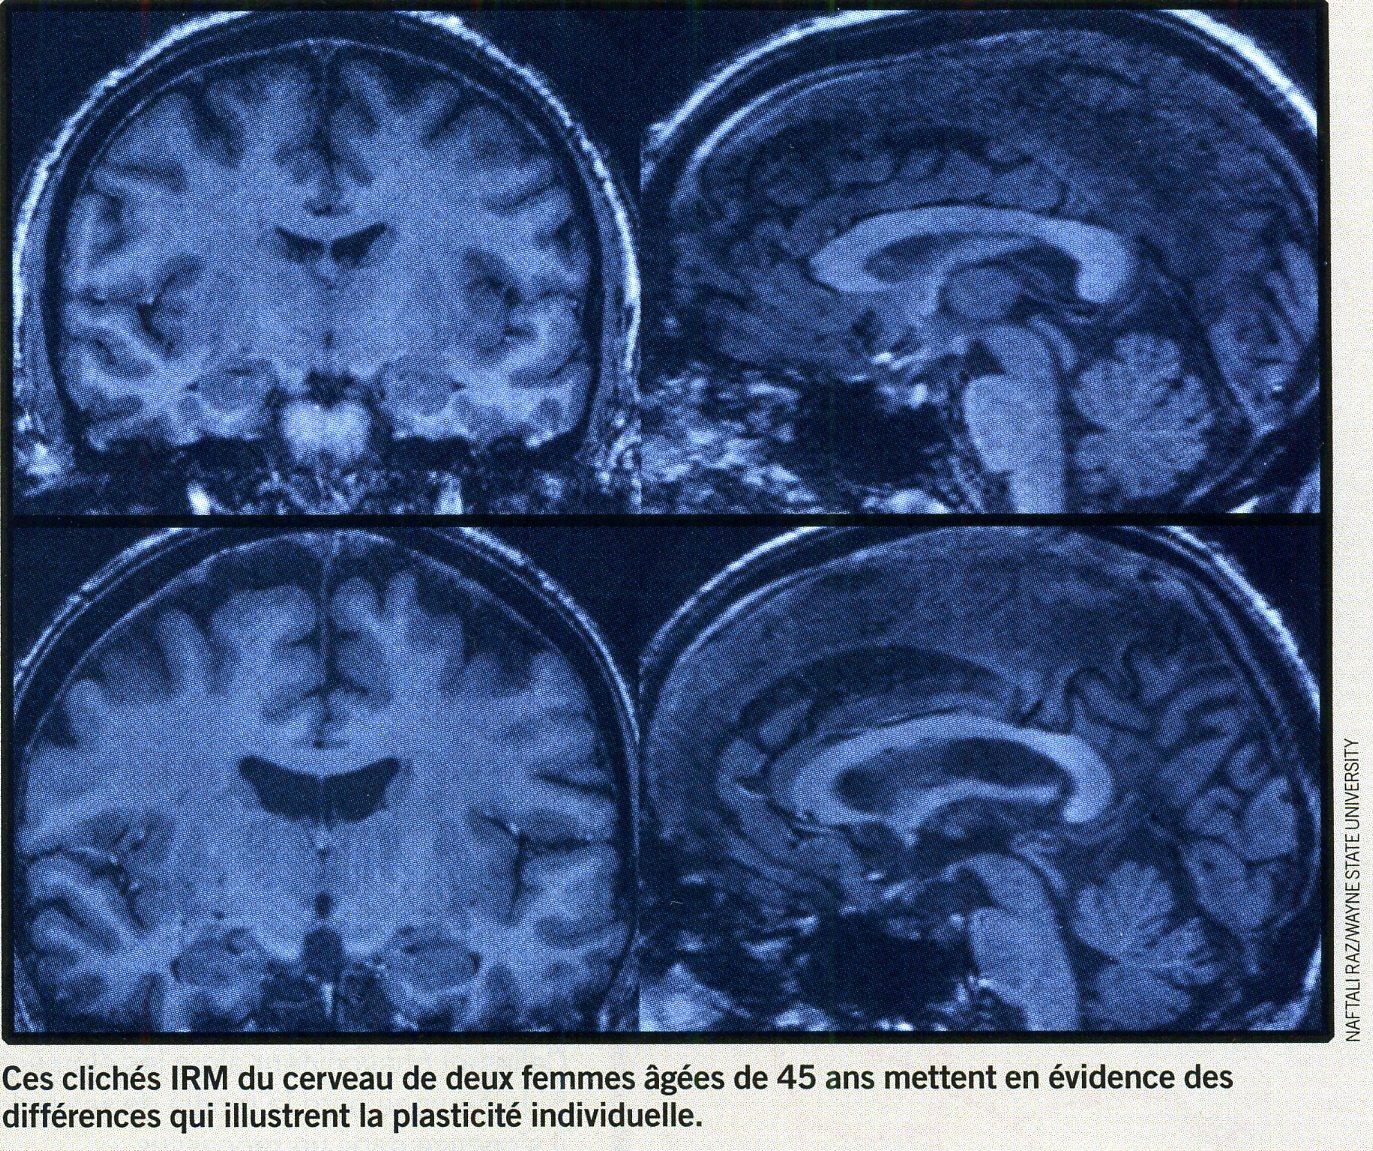 Cerveau plasticité différence